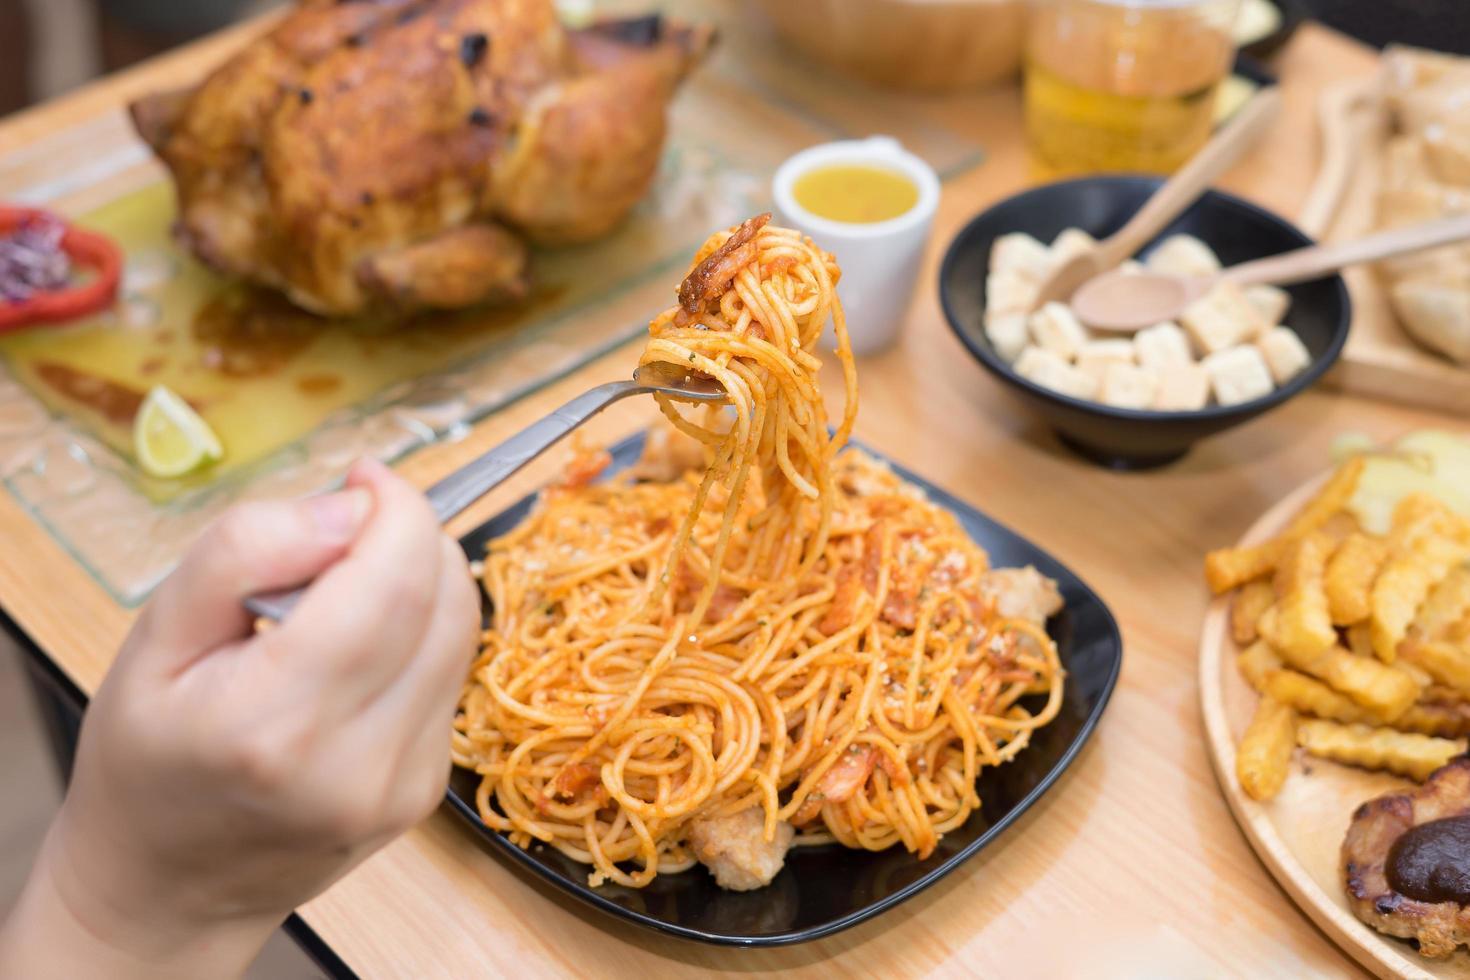 spaghetti servi sur une assiette noire photo